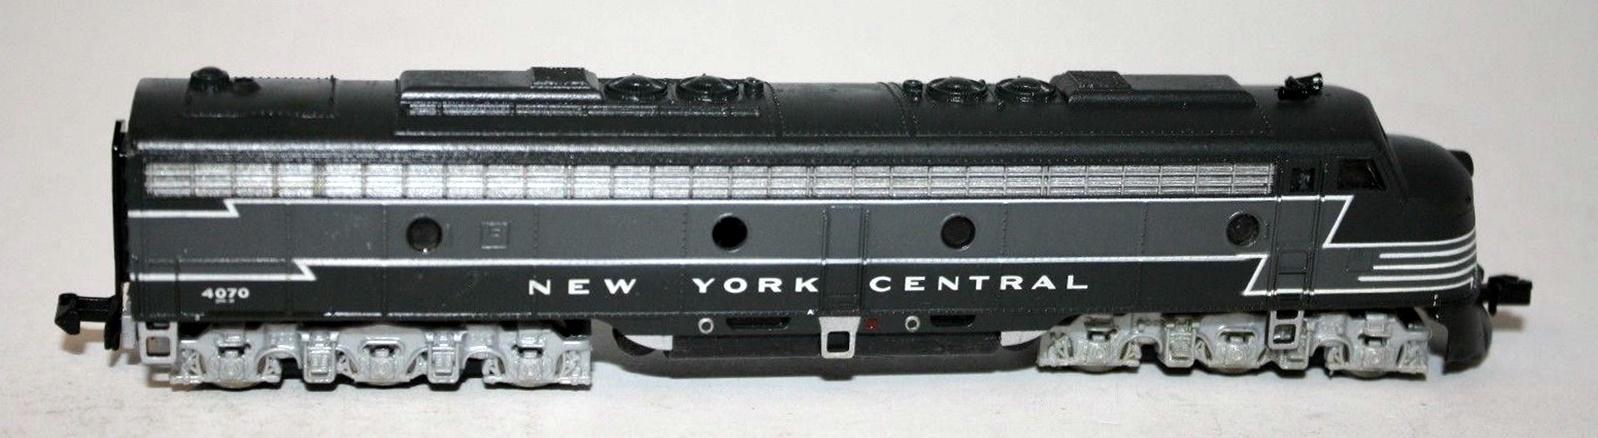 N Scale - Life-Like - 7212 - Locomotive, Diesel, EMD E8 - New York Central - 4070